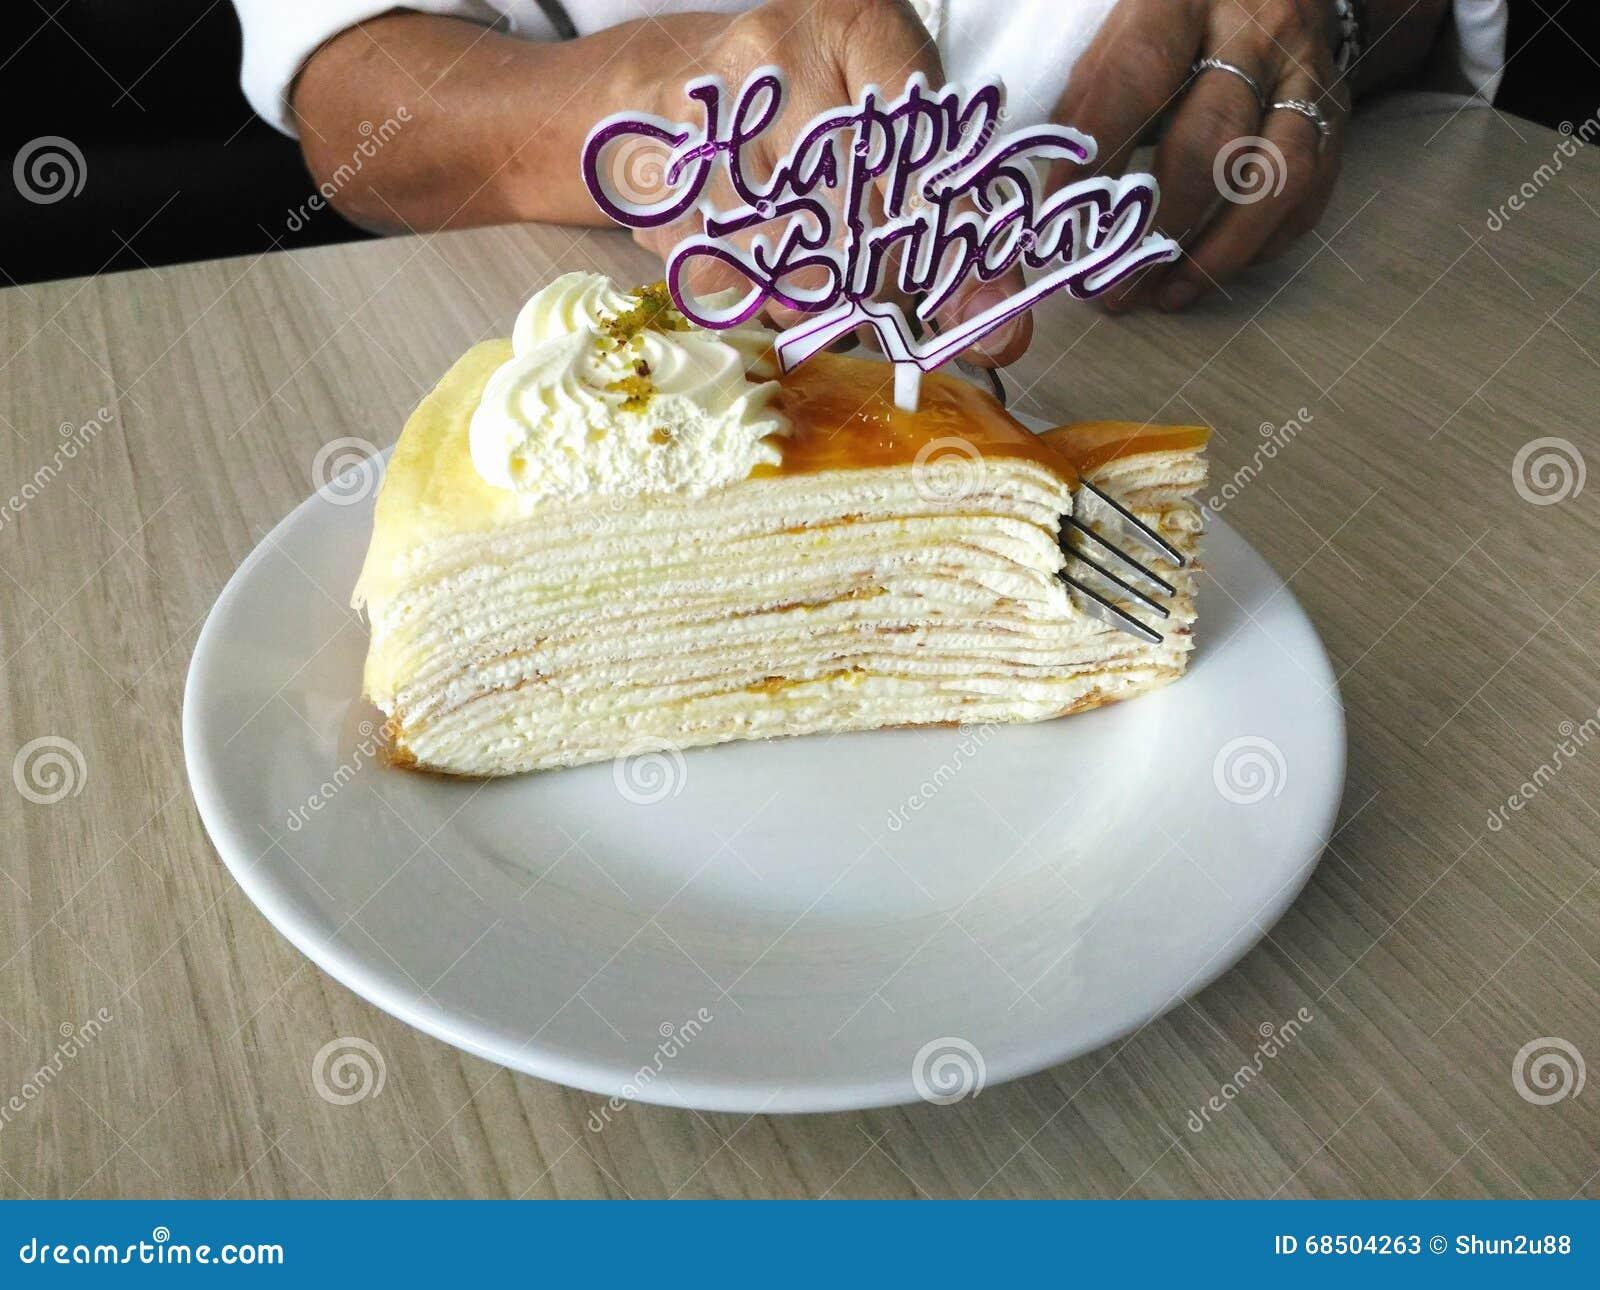 Happy Birthday Cake Stock Image Image Of Festive Sugar 68504263